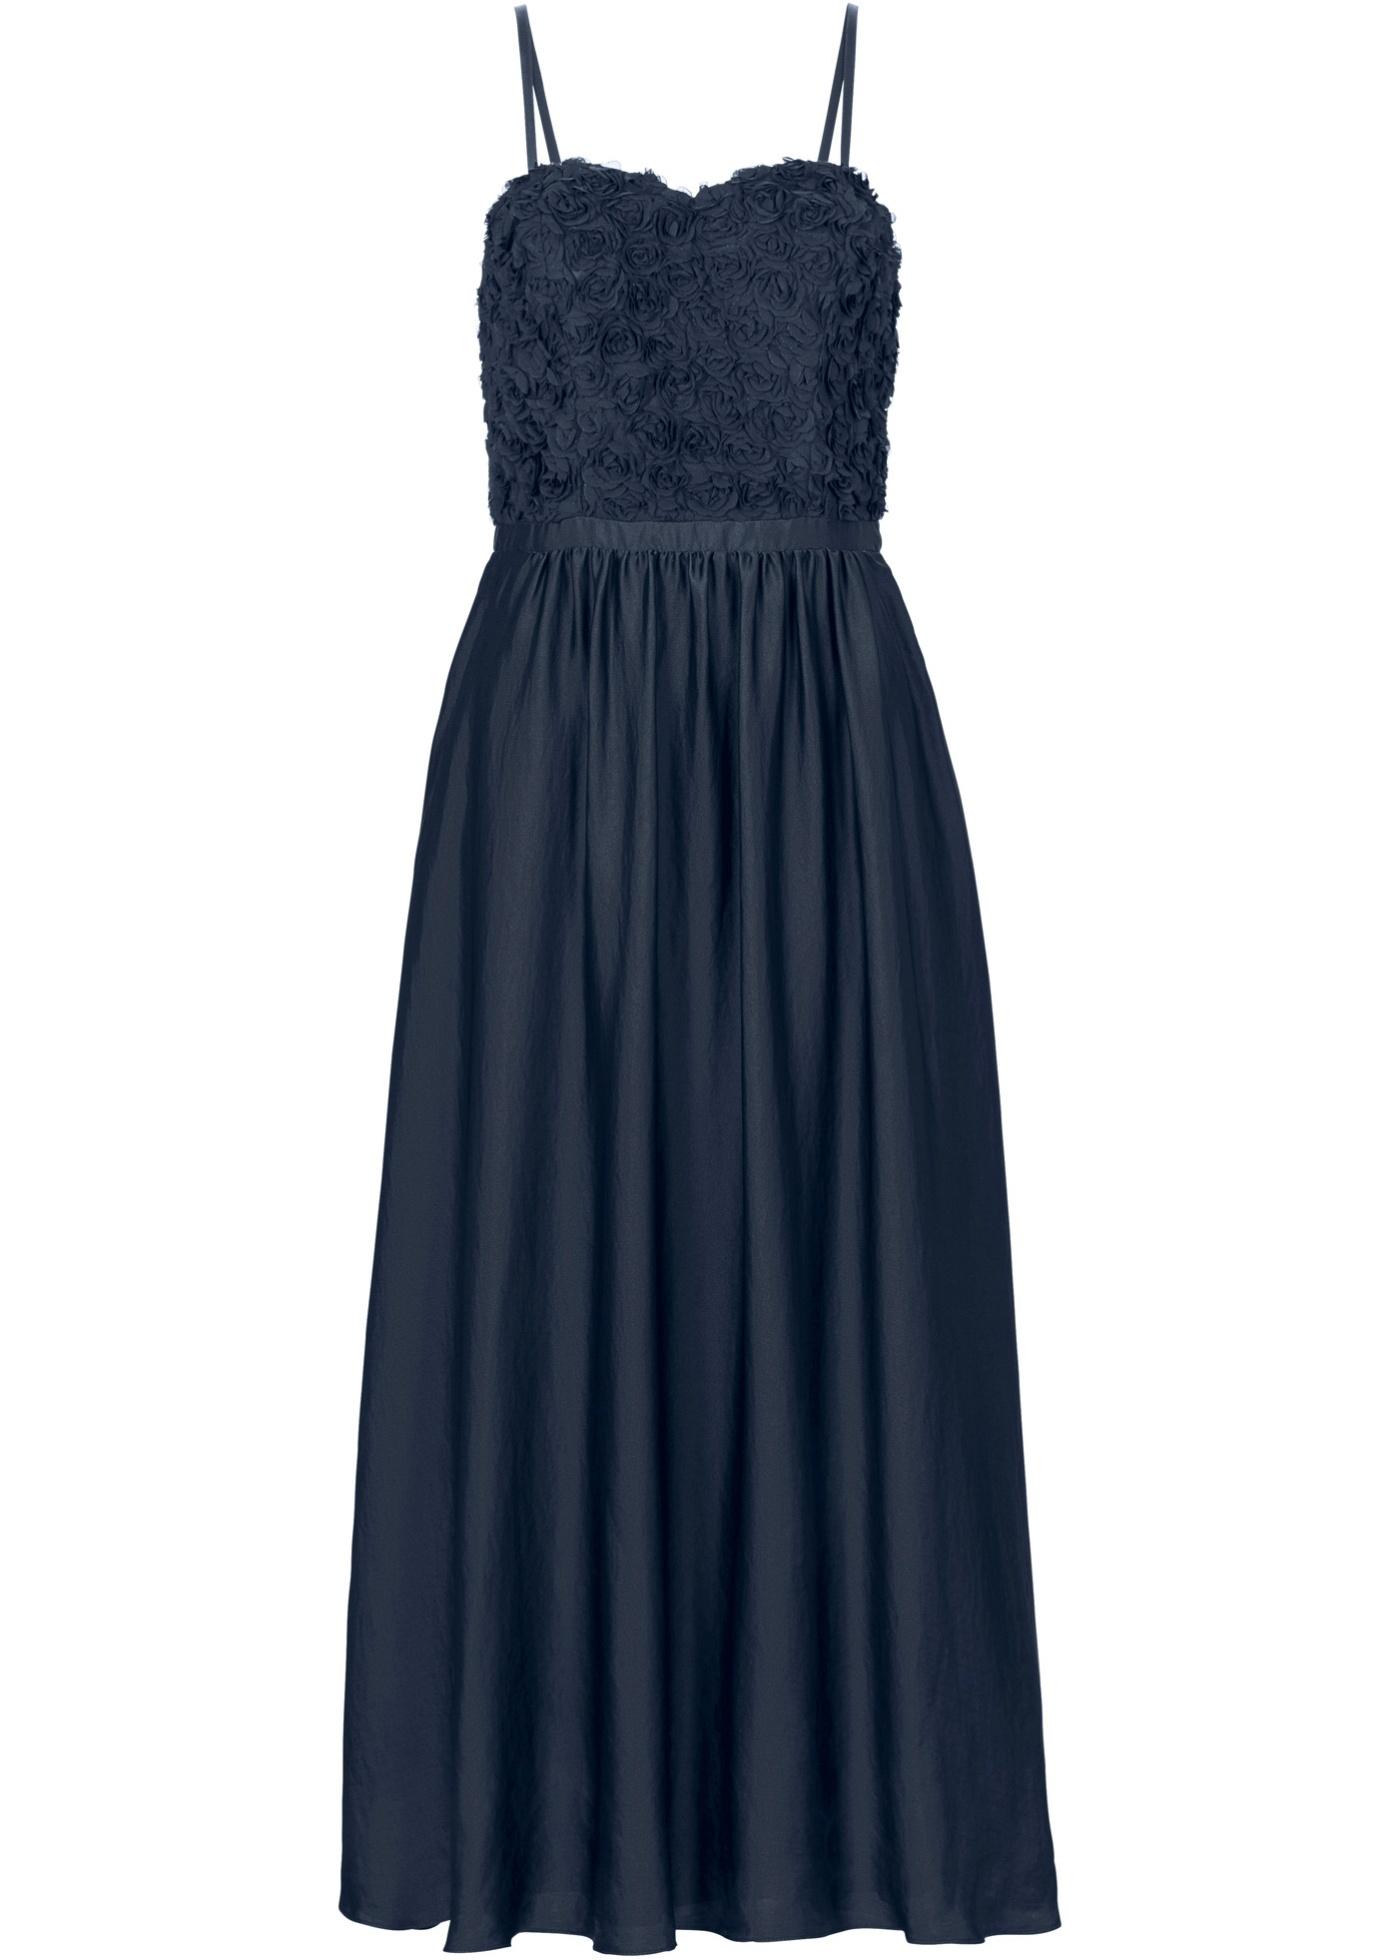 Atemberaubendes Abendkleid Kleid Lang Dunkelblau Blau mit ...